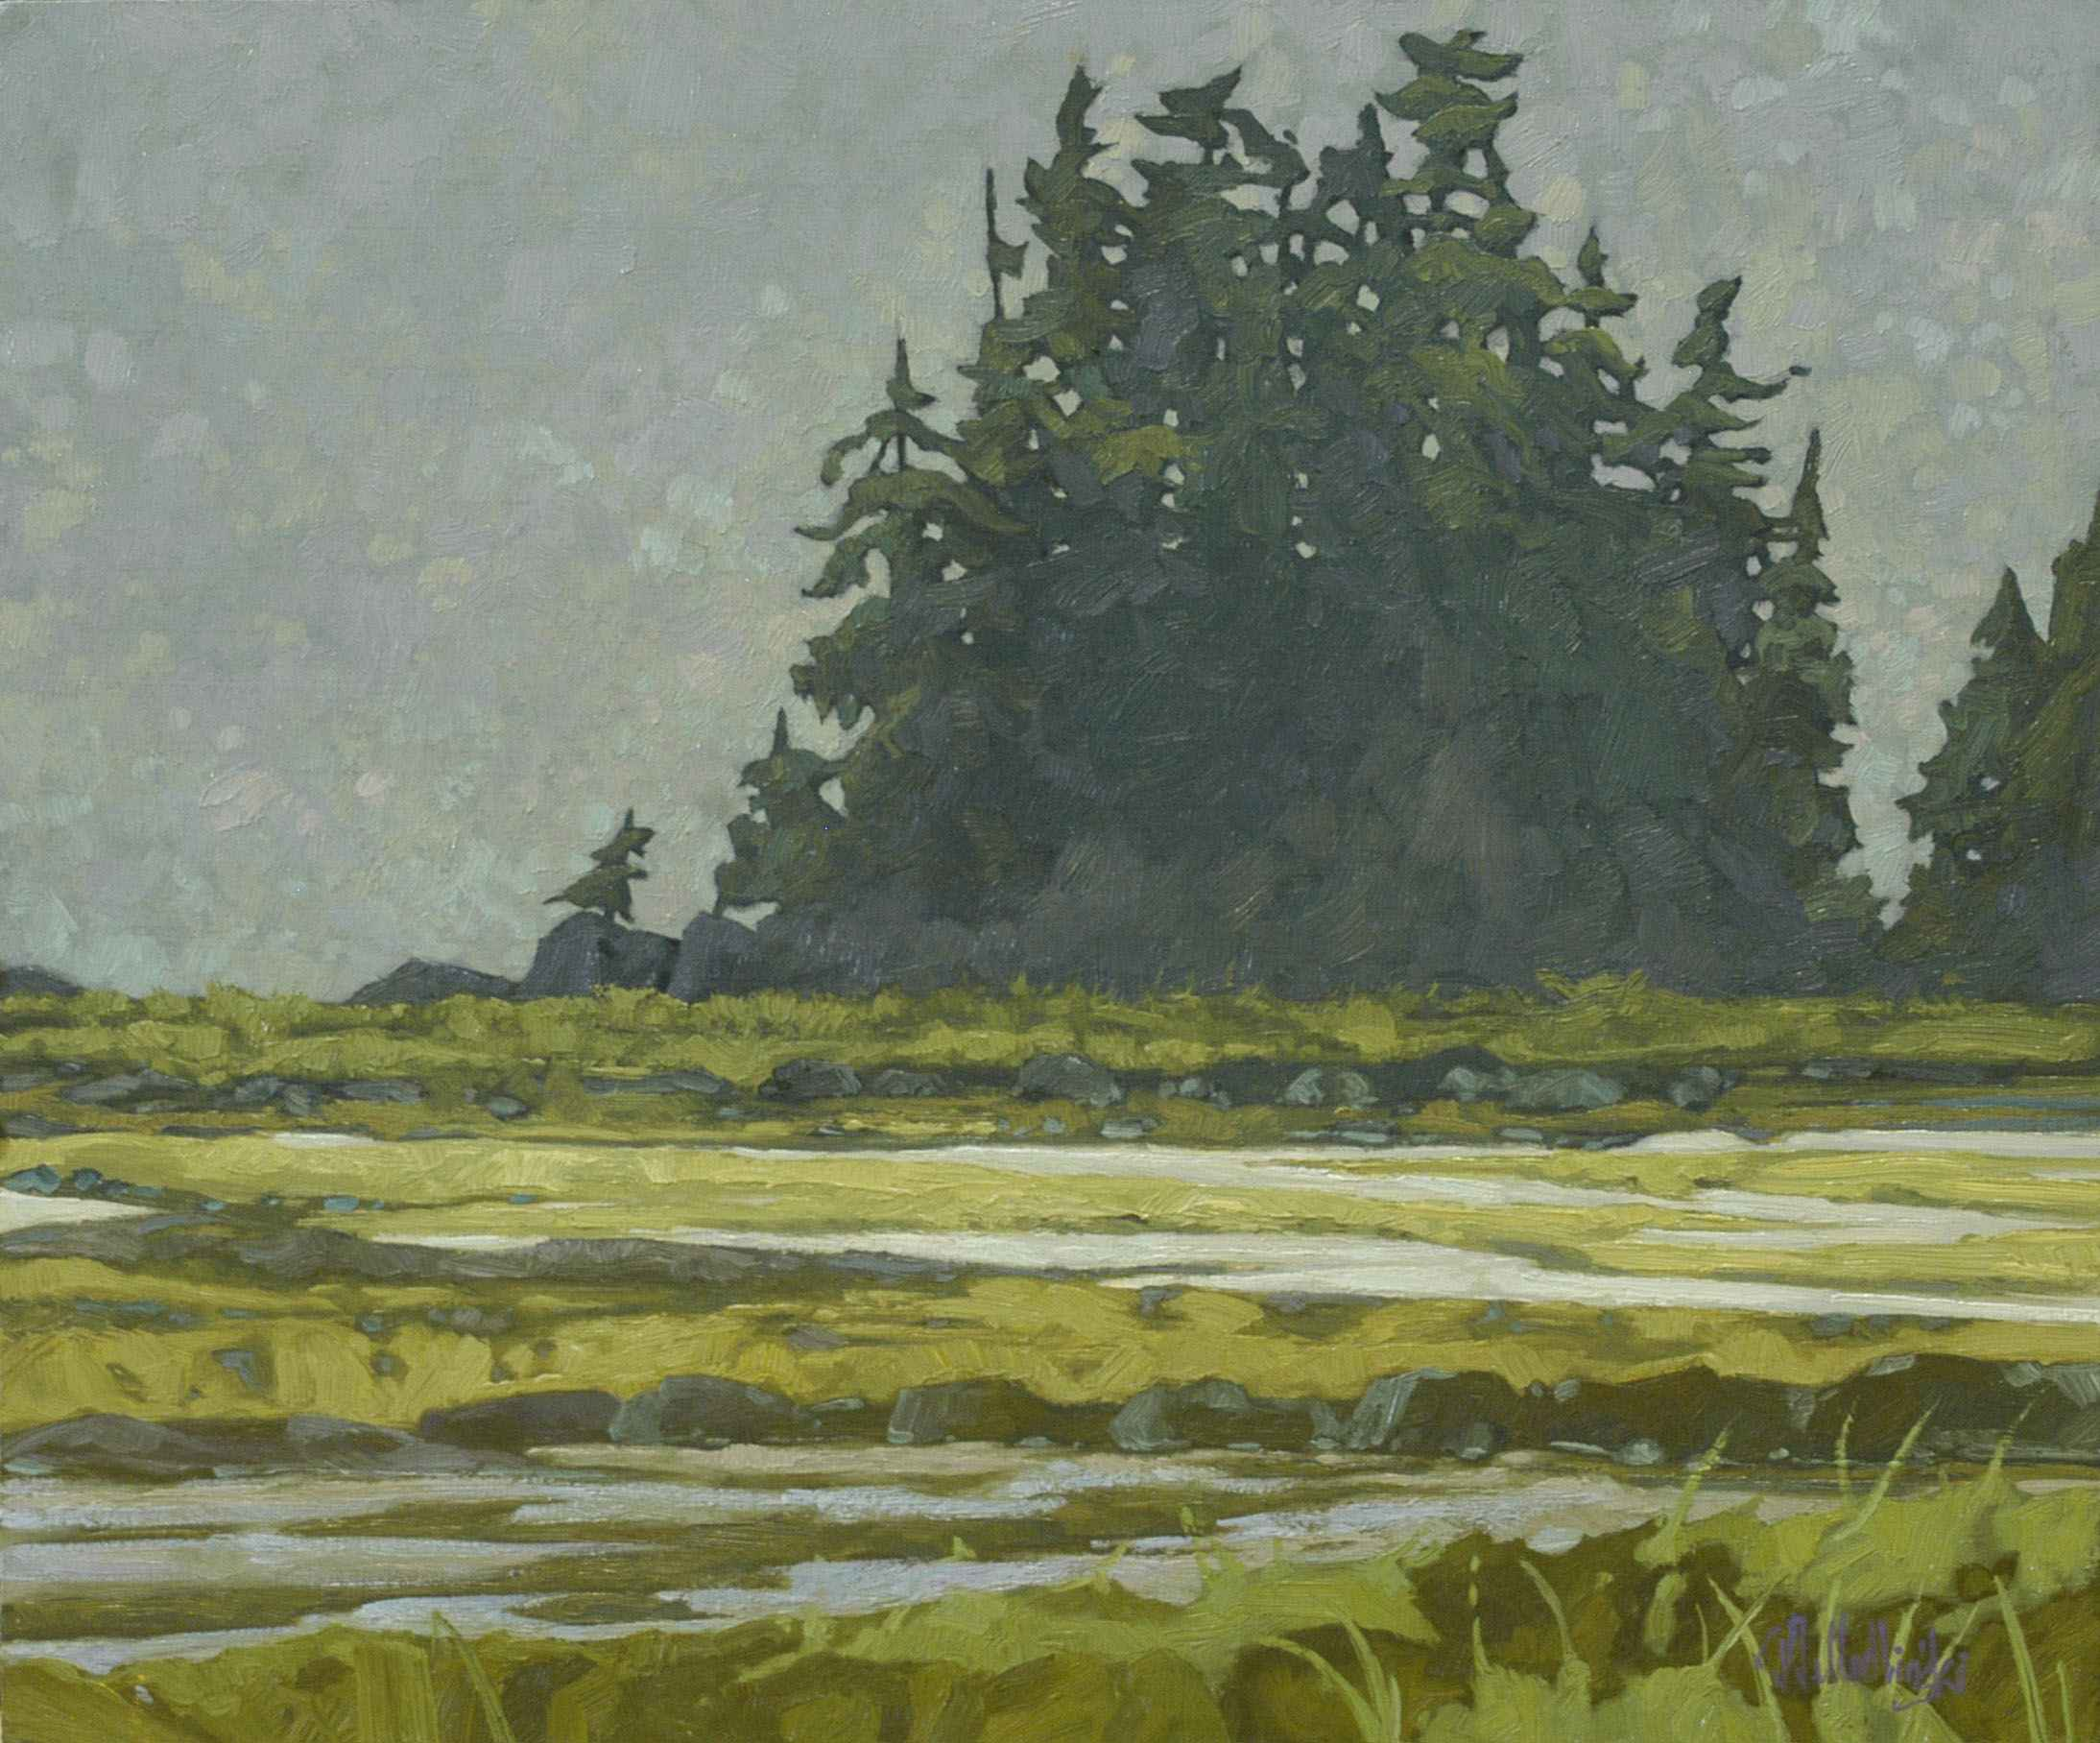 Along the Shore by  Dominik Modlinski - Masterpiece Online